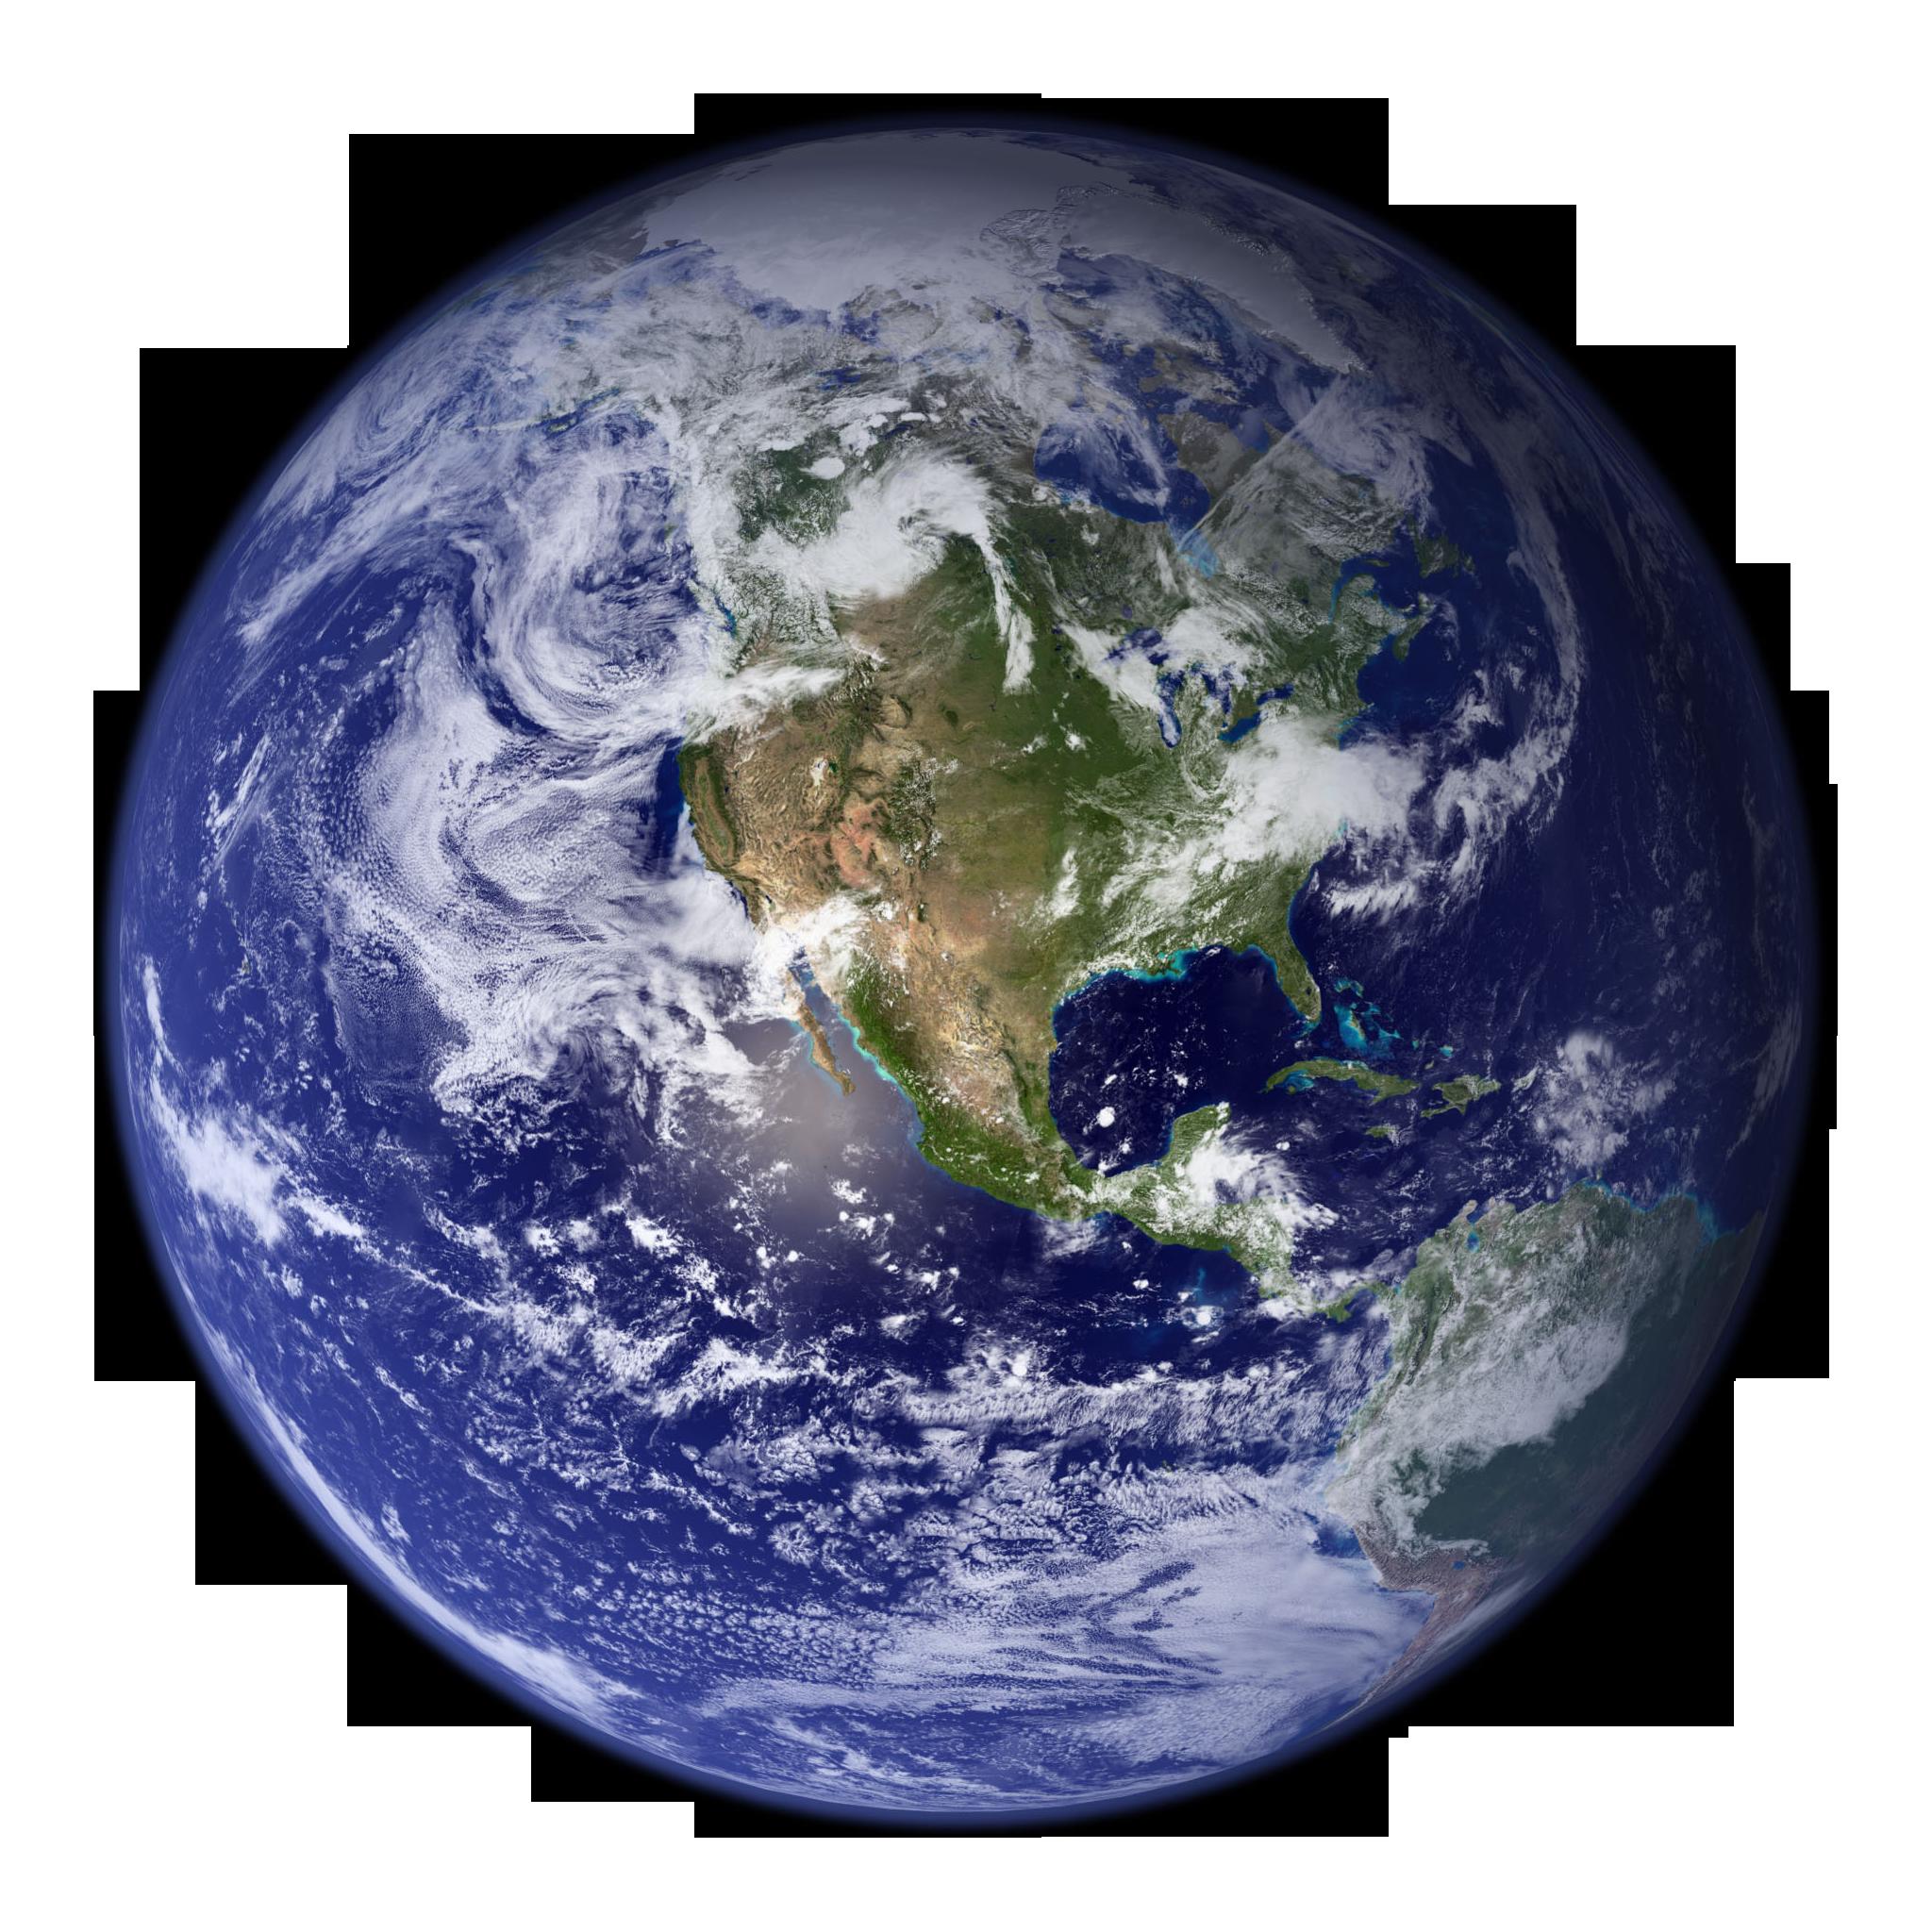 Earth_Western_Hemisphere_transparent_background.png